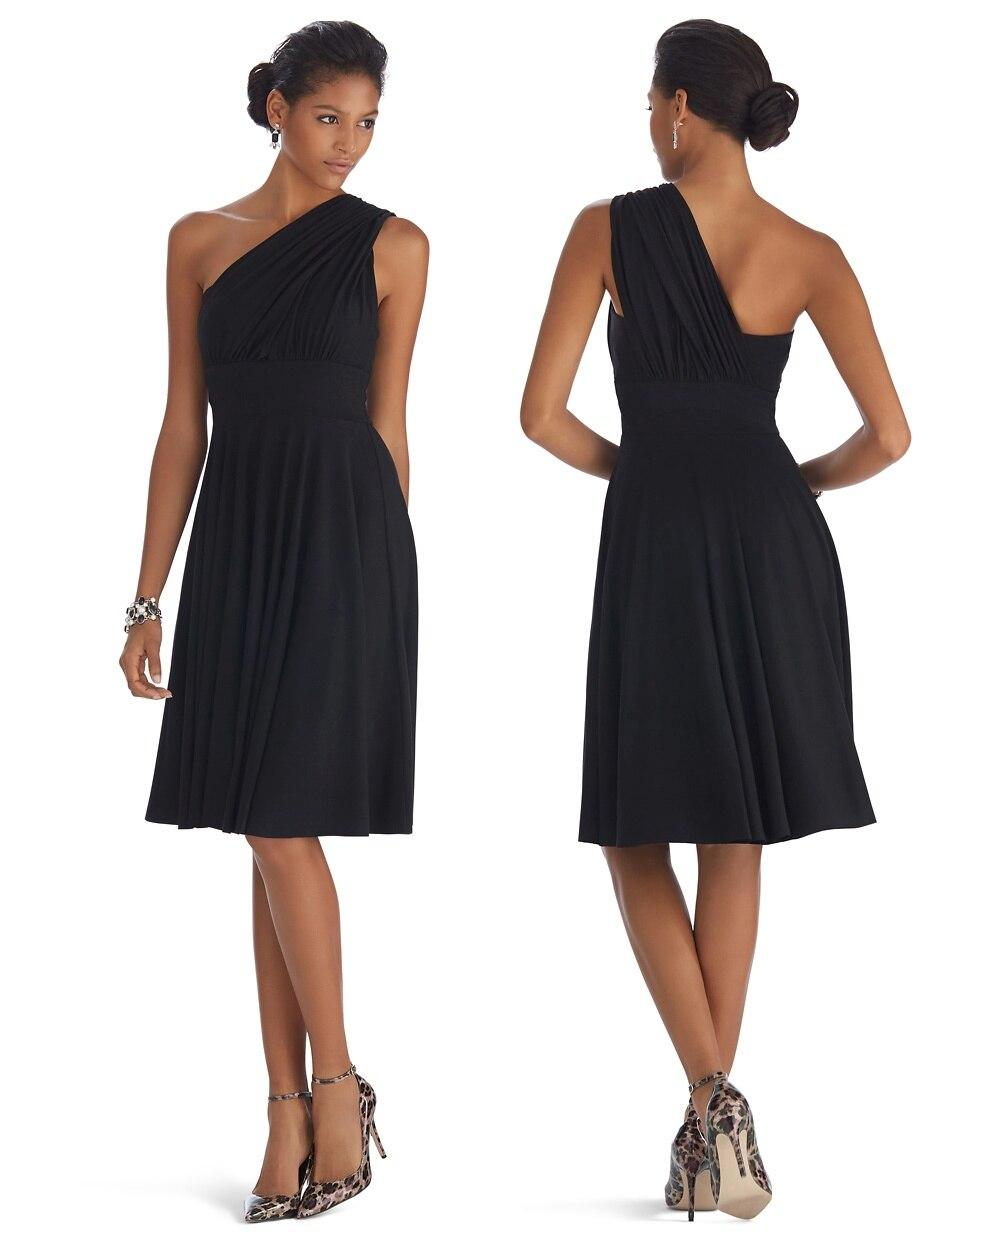 Genius Convertible Fit Flare Black Dress